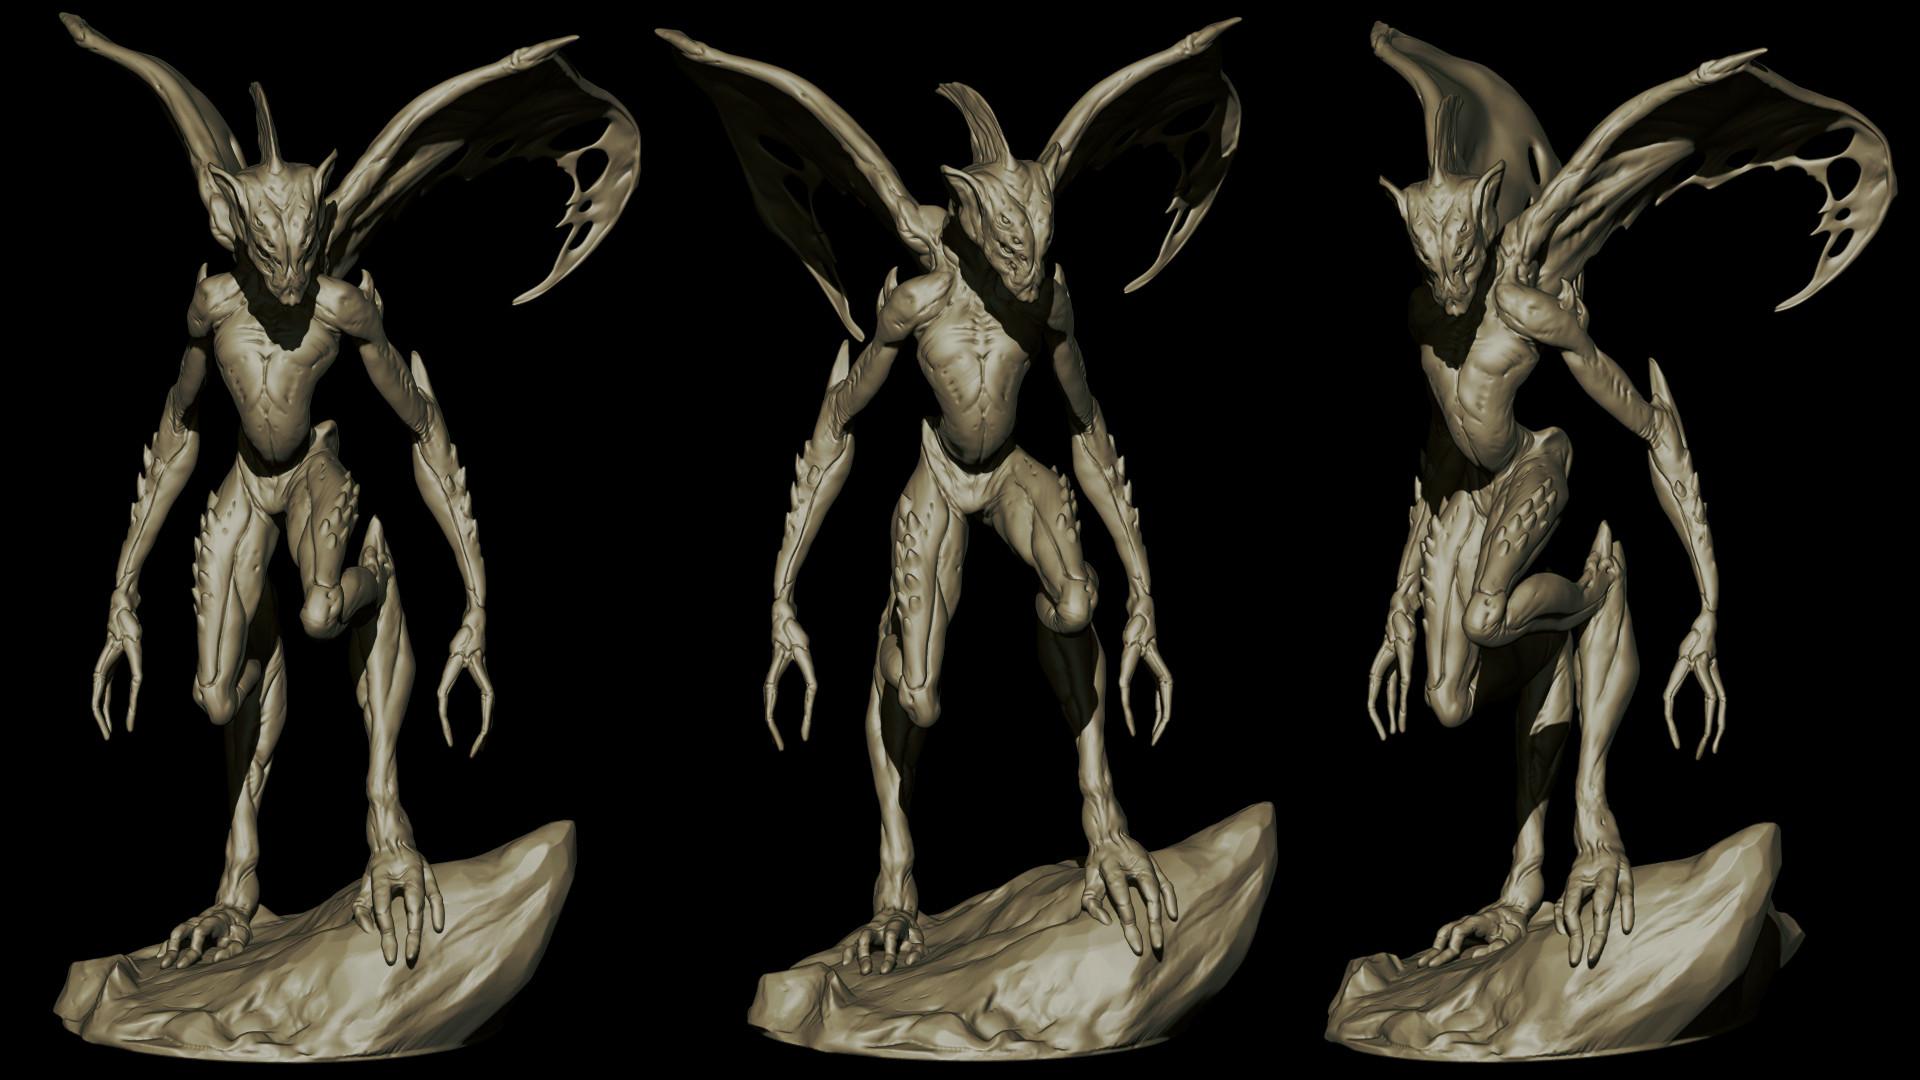 Ilhan yilmaz creature render 08